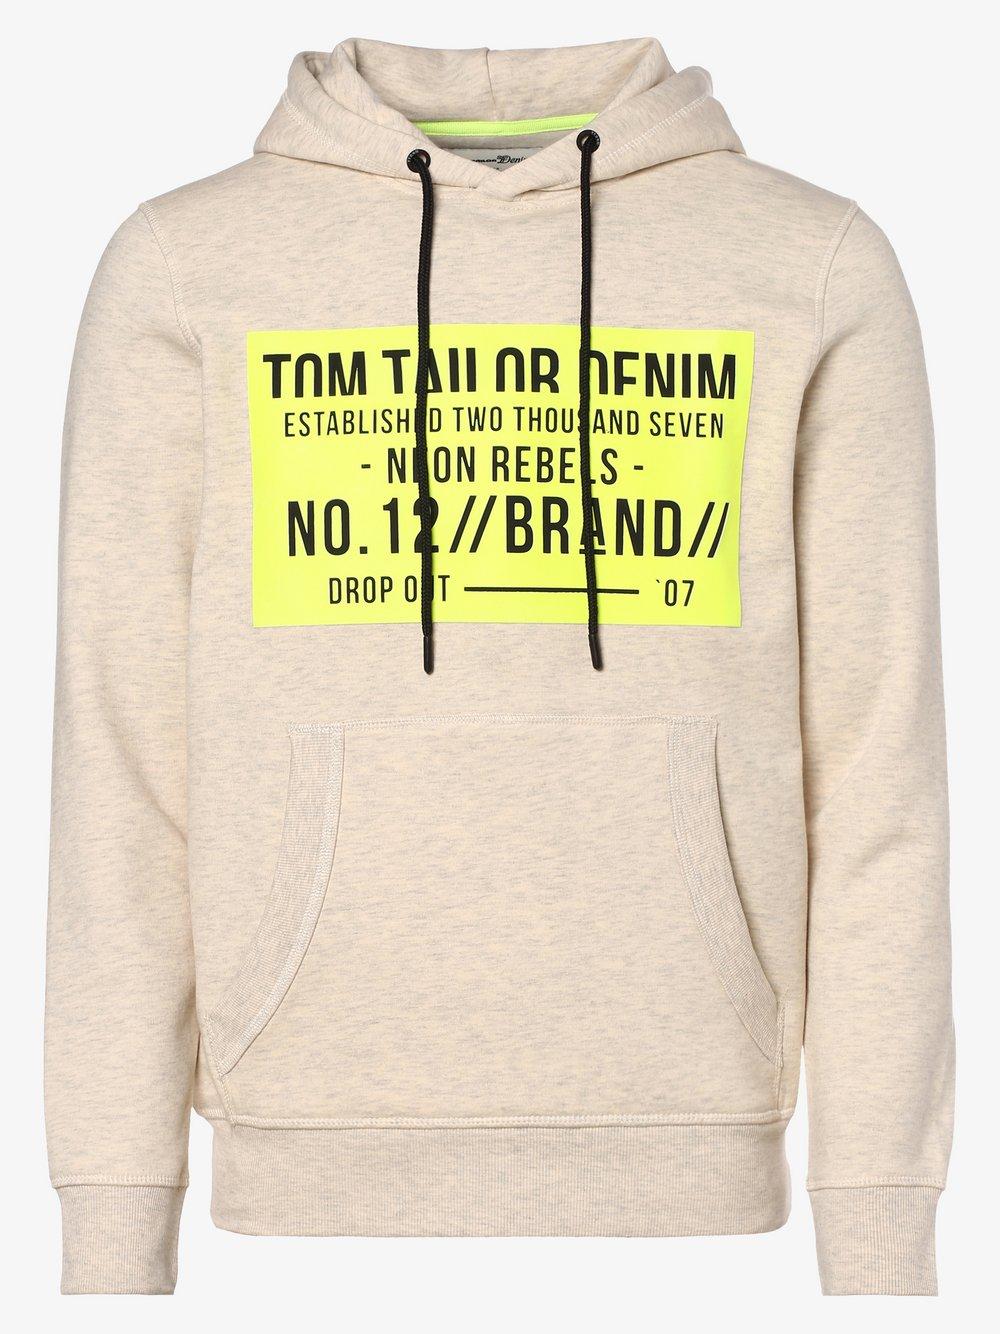 Tom Tailor Denim - Męska bluza nierozpinana, szary